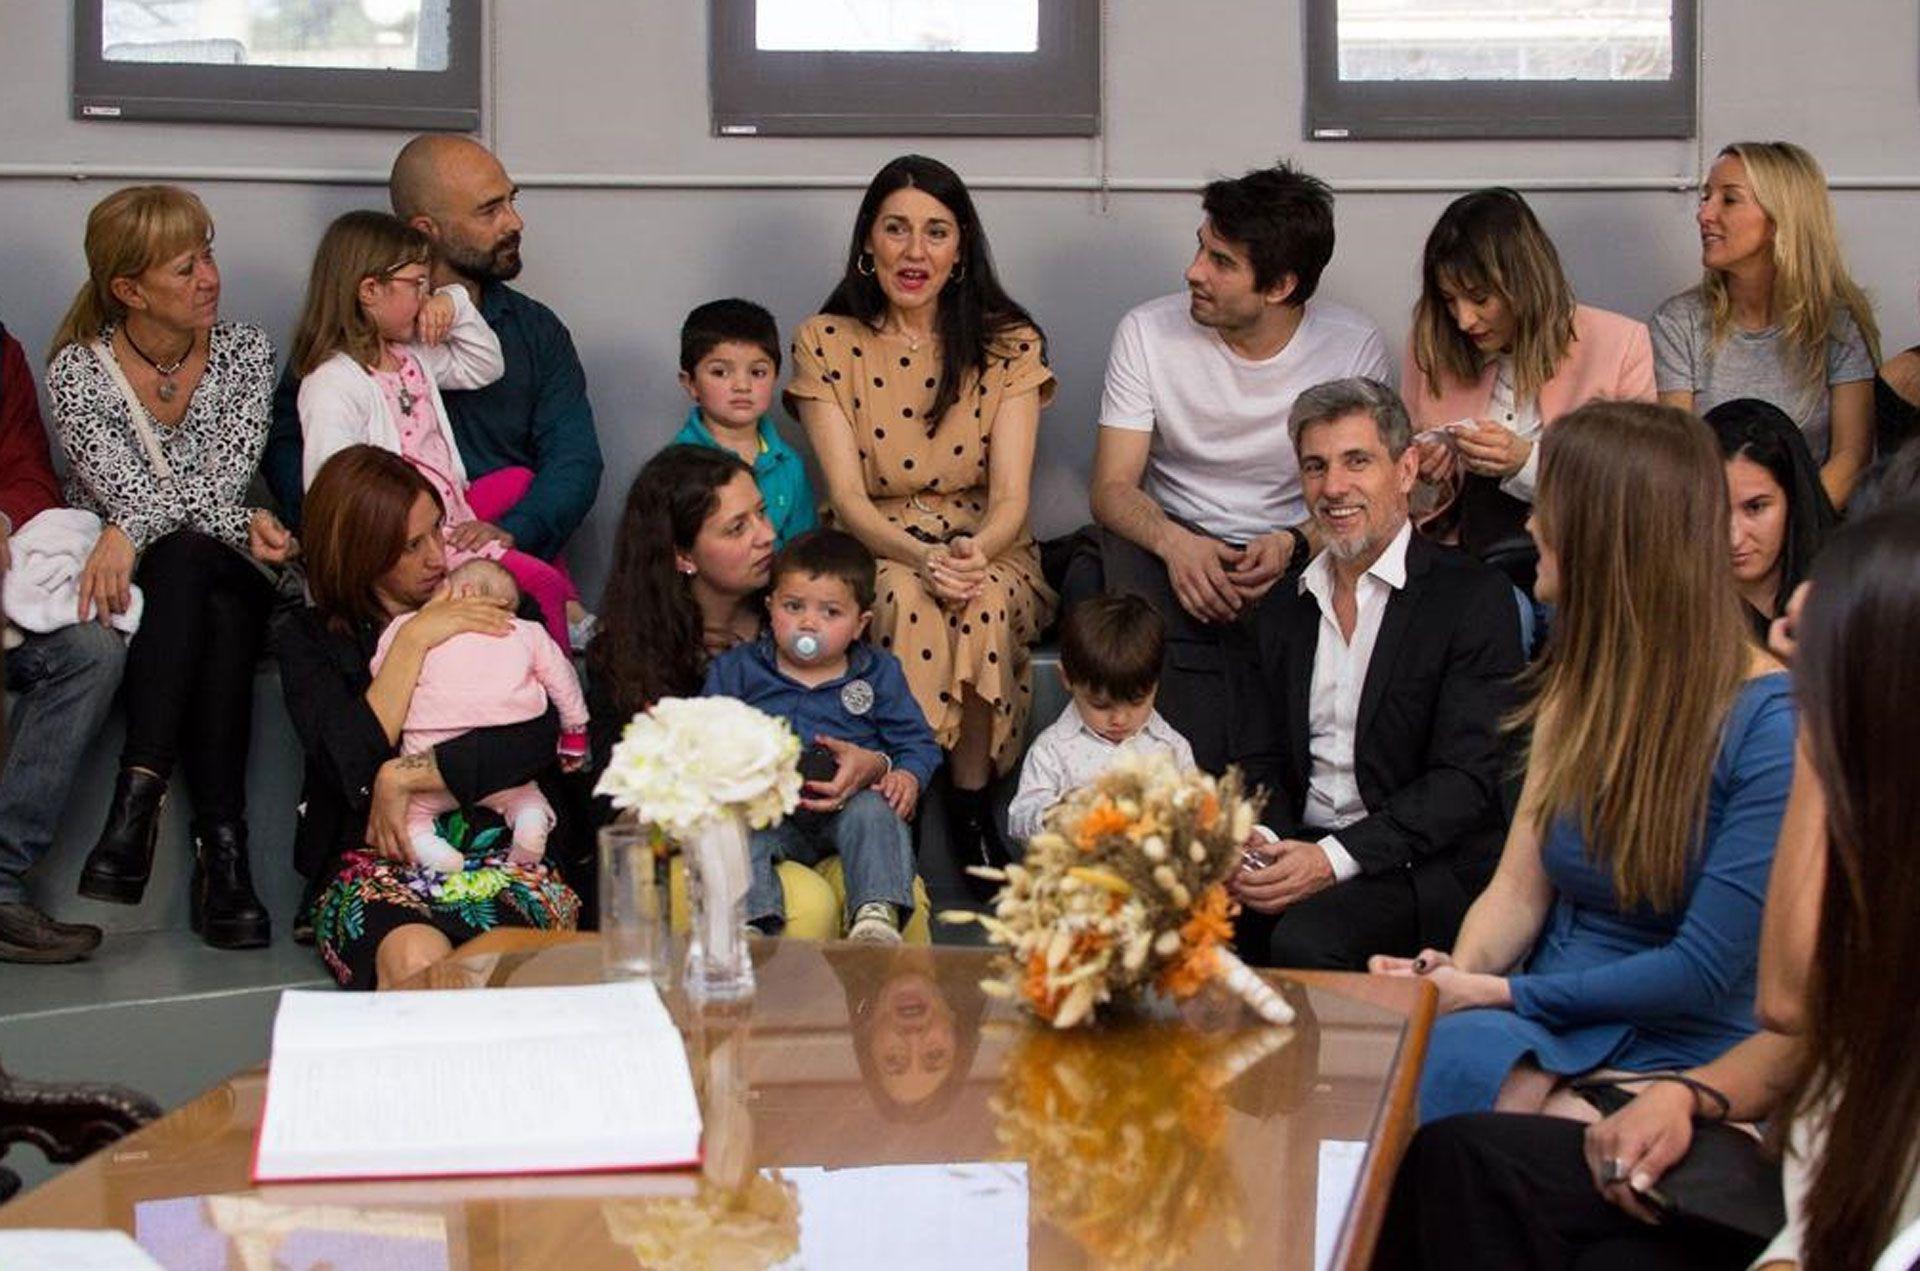 La familia de la novia viajó a Córdoba para acompañarla en este día tan especial (Teleshow)